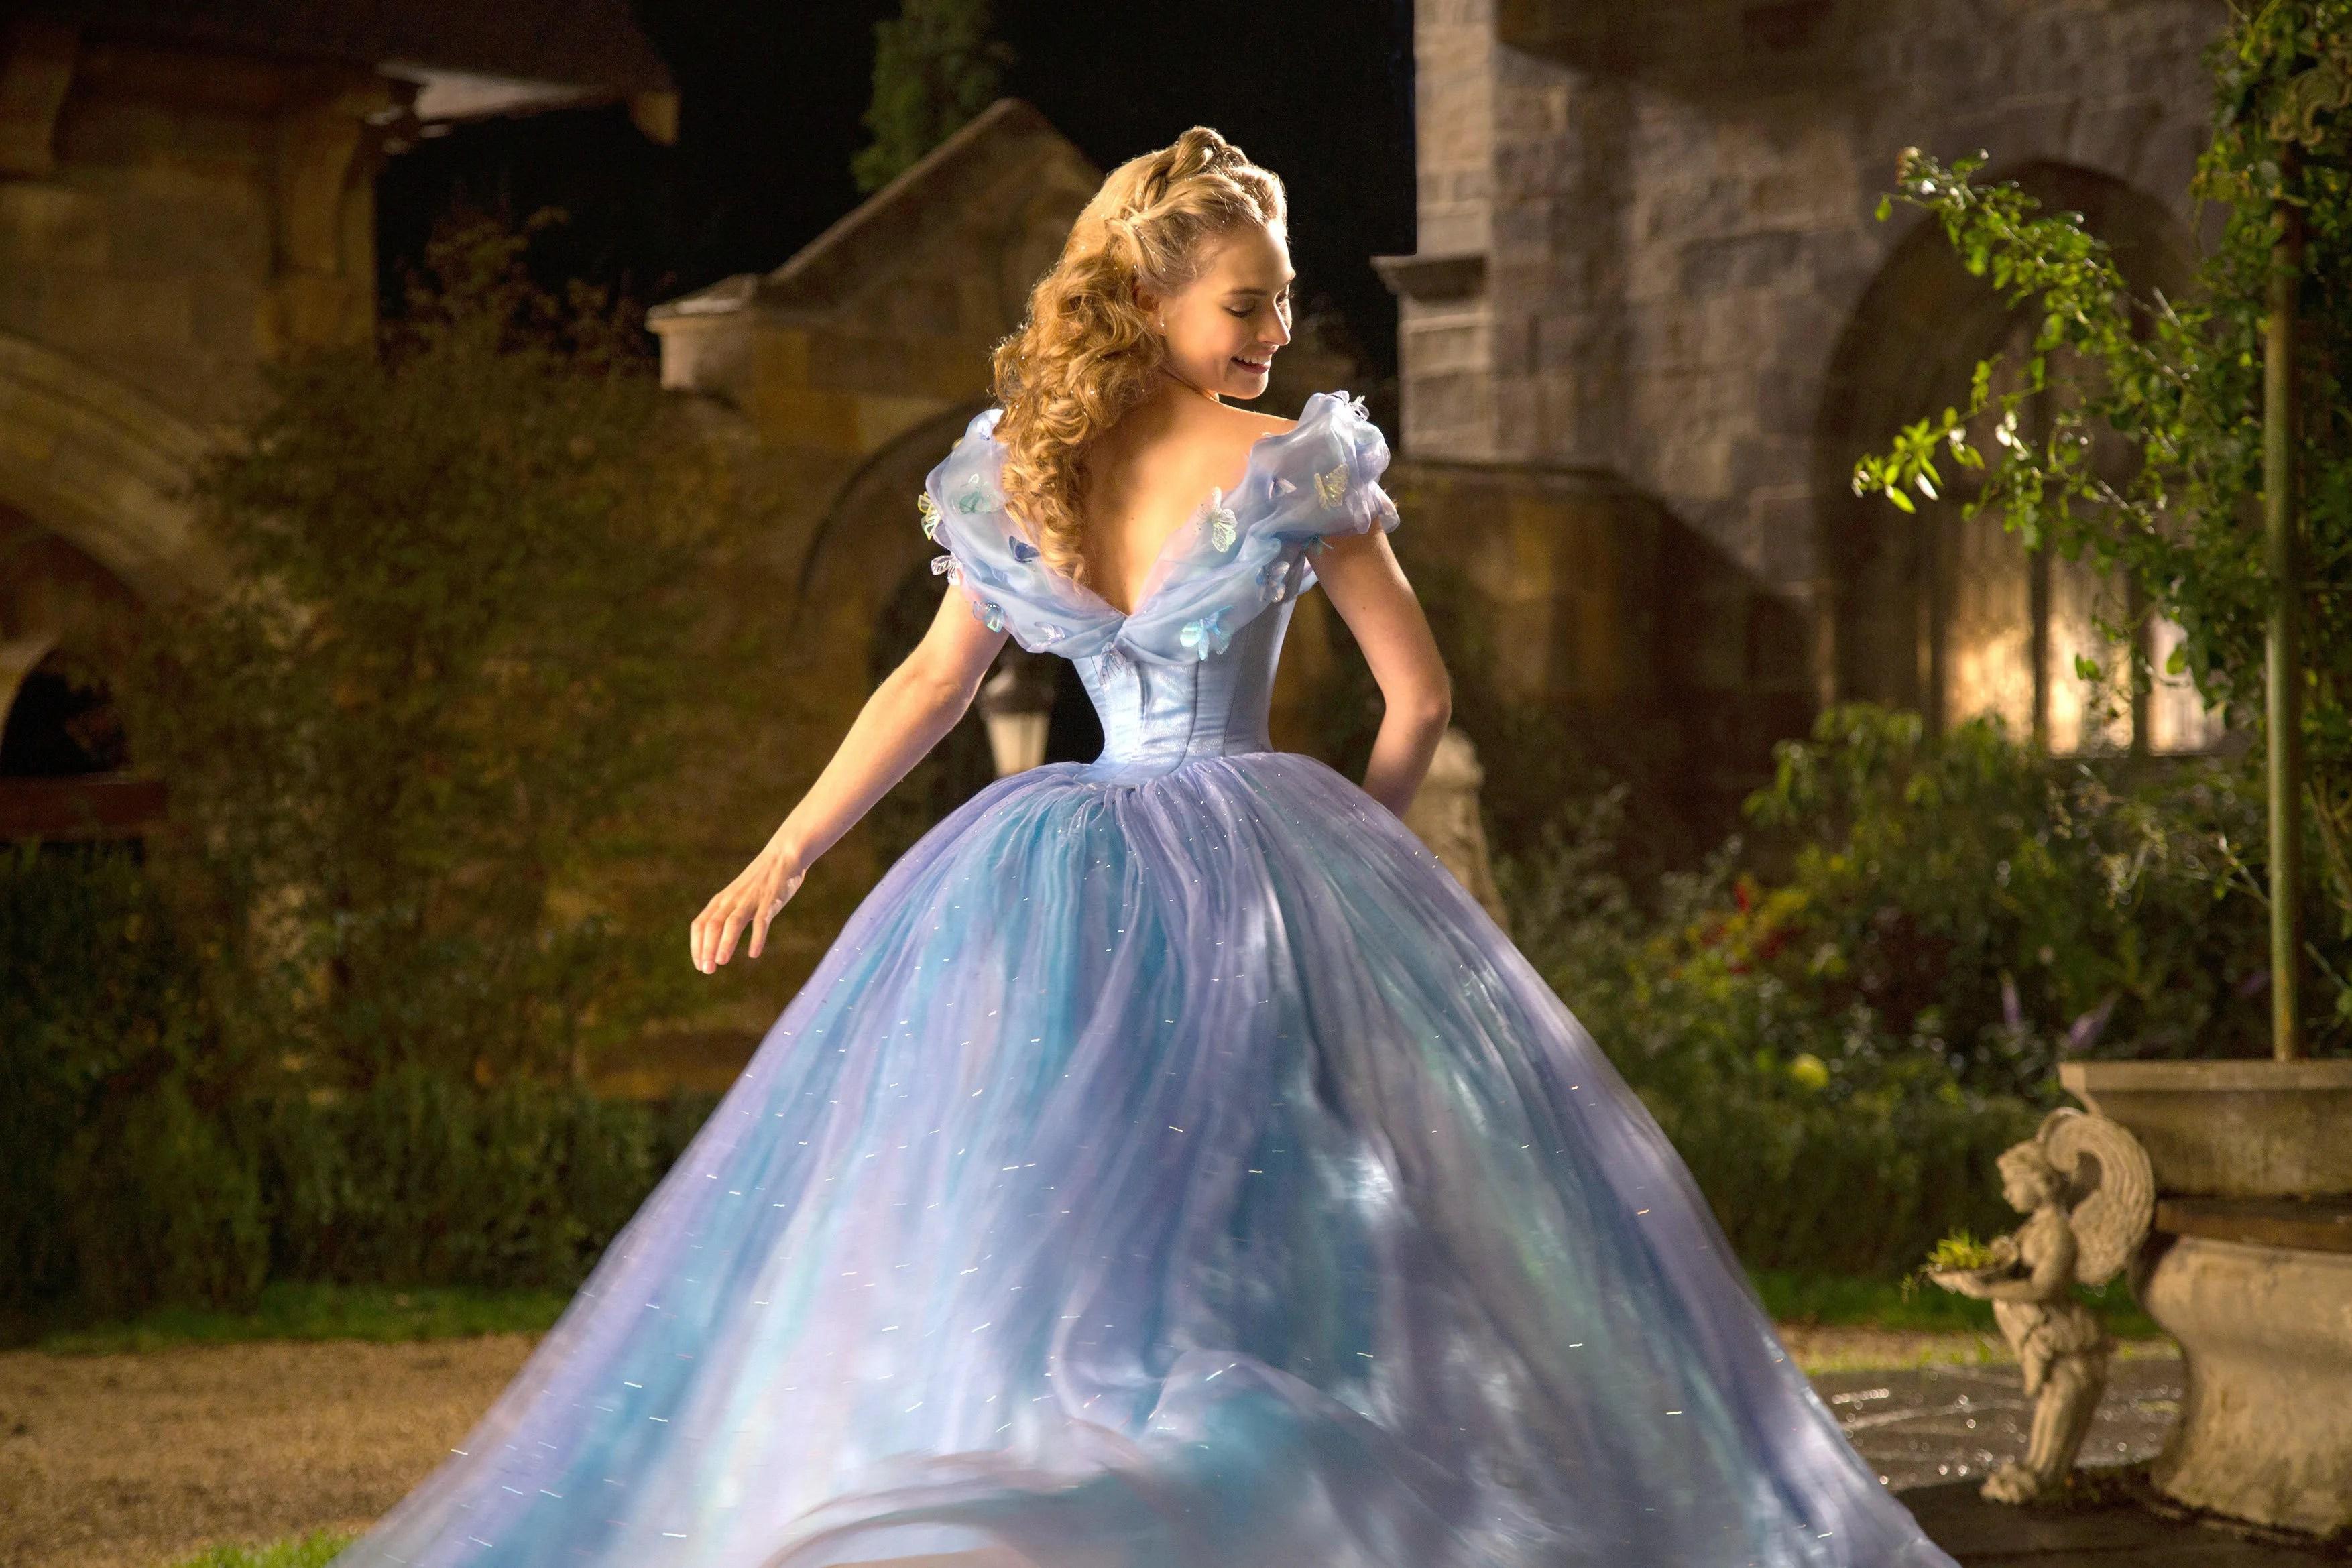 wedding dress like cinderella story cinderella wedding dresses This Real Life Cinderella Wore A Magical Light Up Wedding Dress Glamour